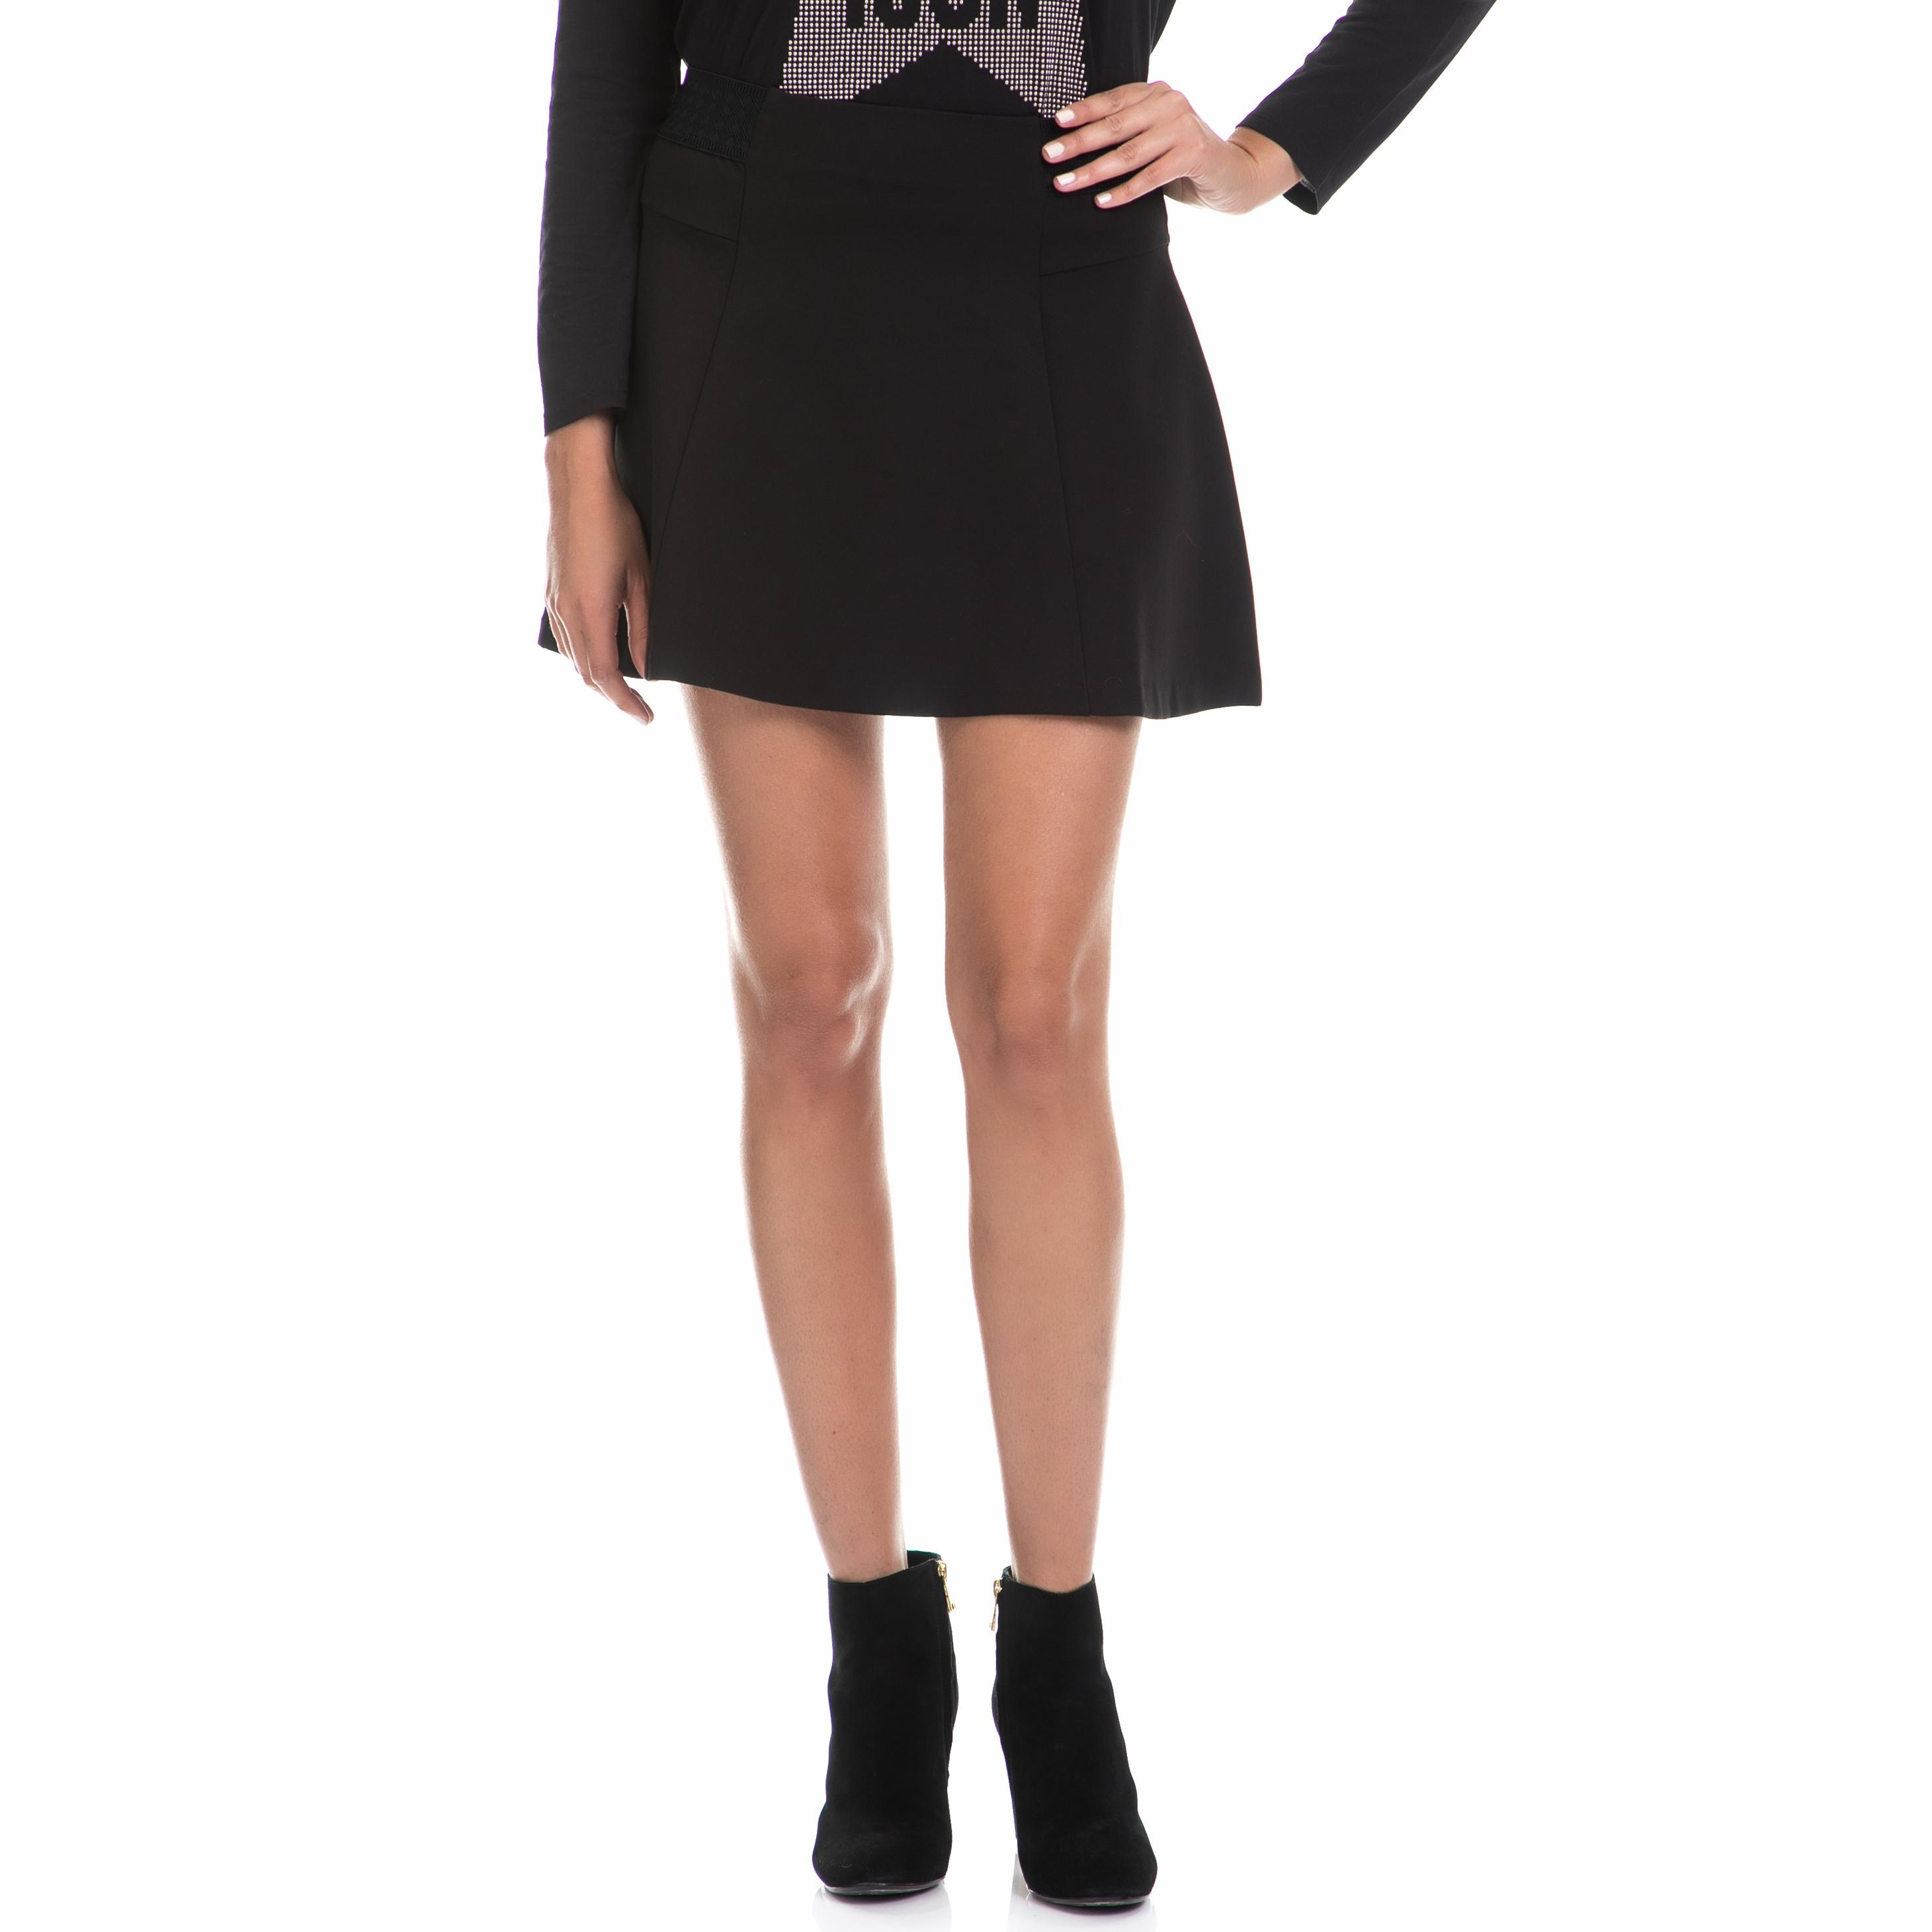 JUICY COUTURE - Γυναικεία φούστα KNT PONTE FLIRTY μαύρη